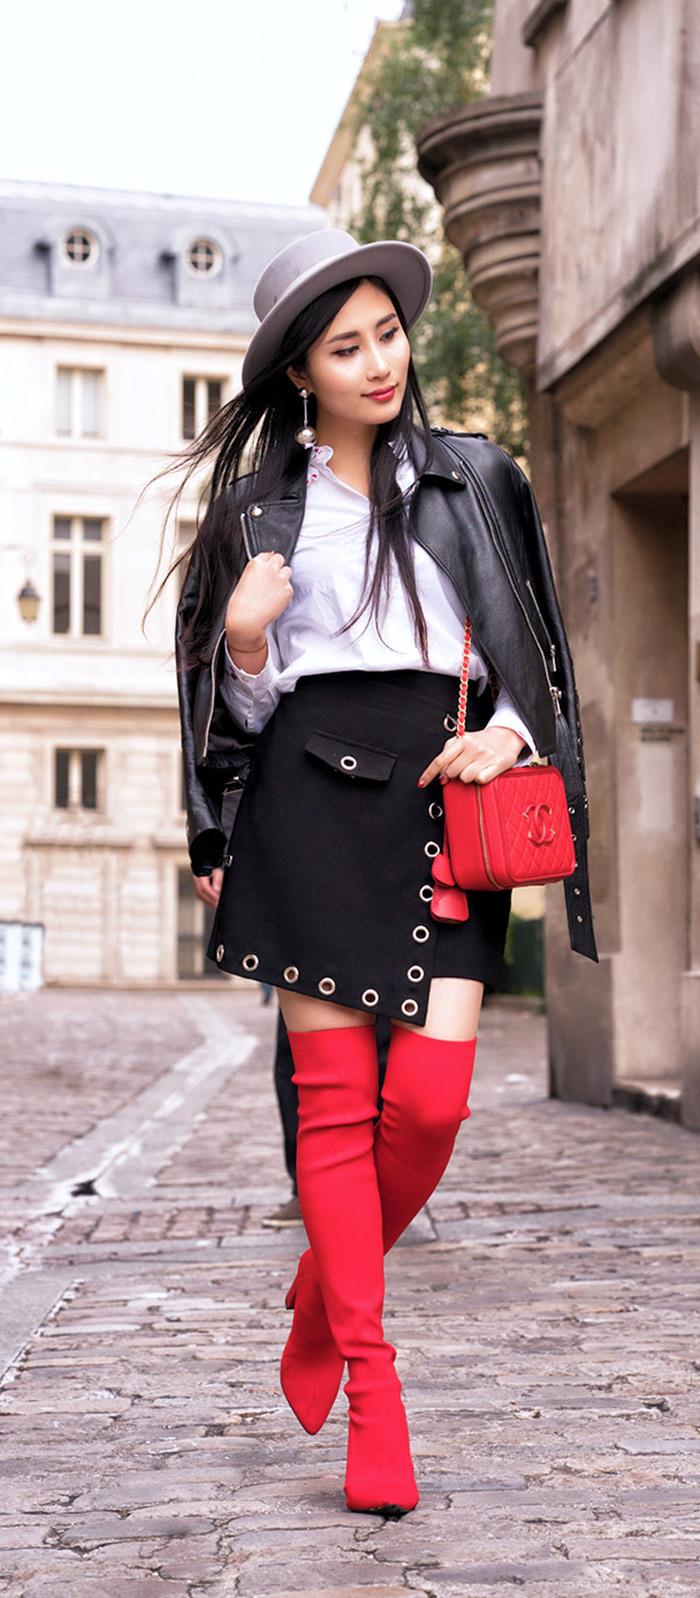 red dress knee high boots